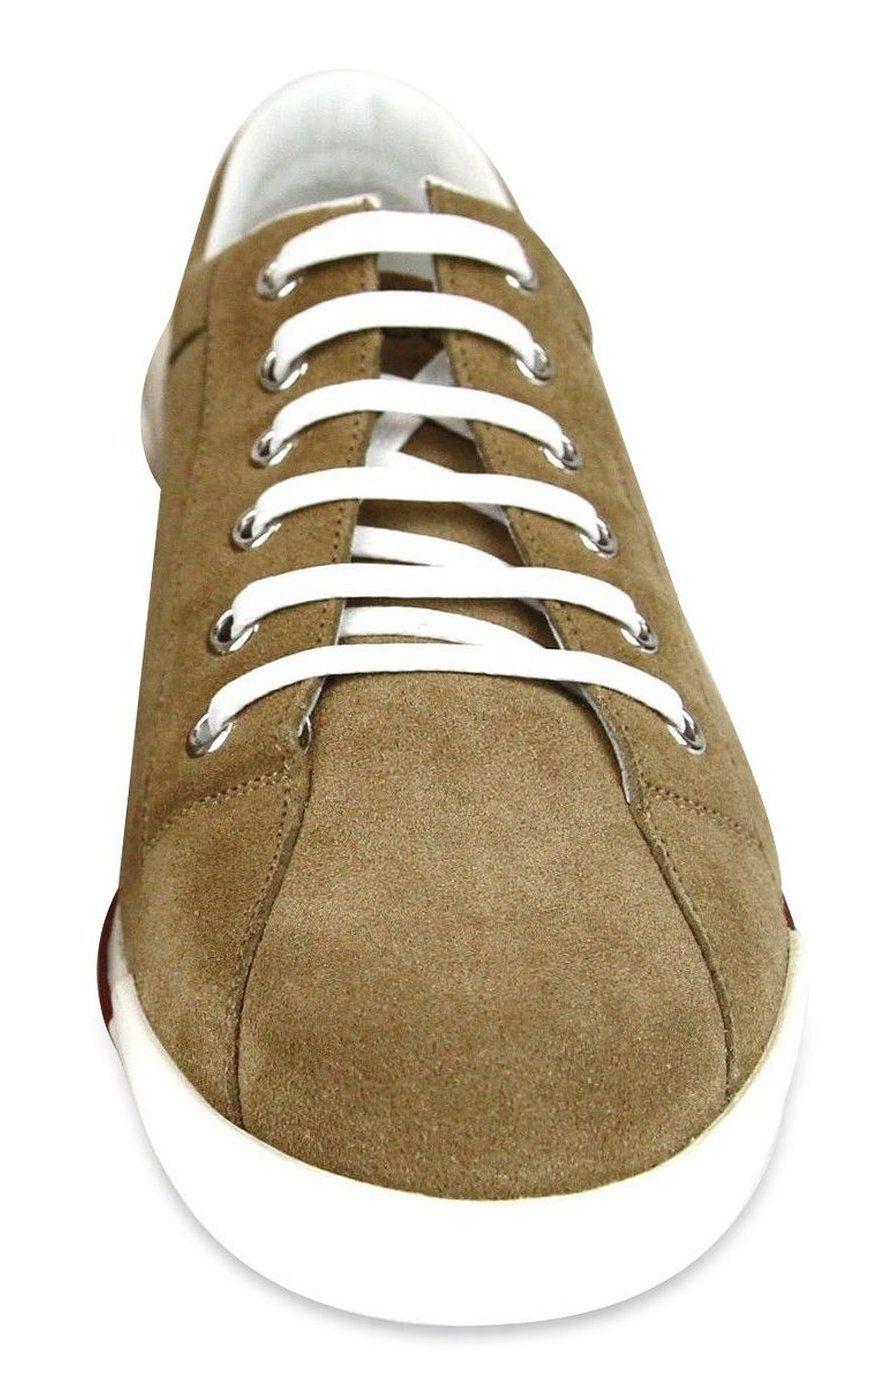 3ff442efa01 Gucci Women s Brown Suede Script Logo Trainer Sneakers 281017 CBB00 2309  Size Gucci Sneakers - 38.5